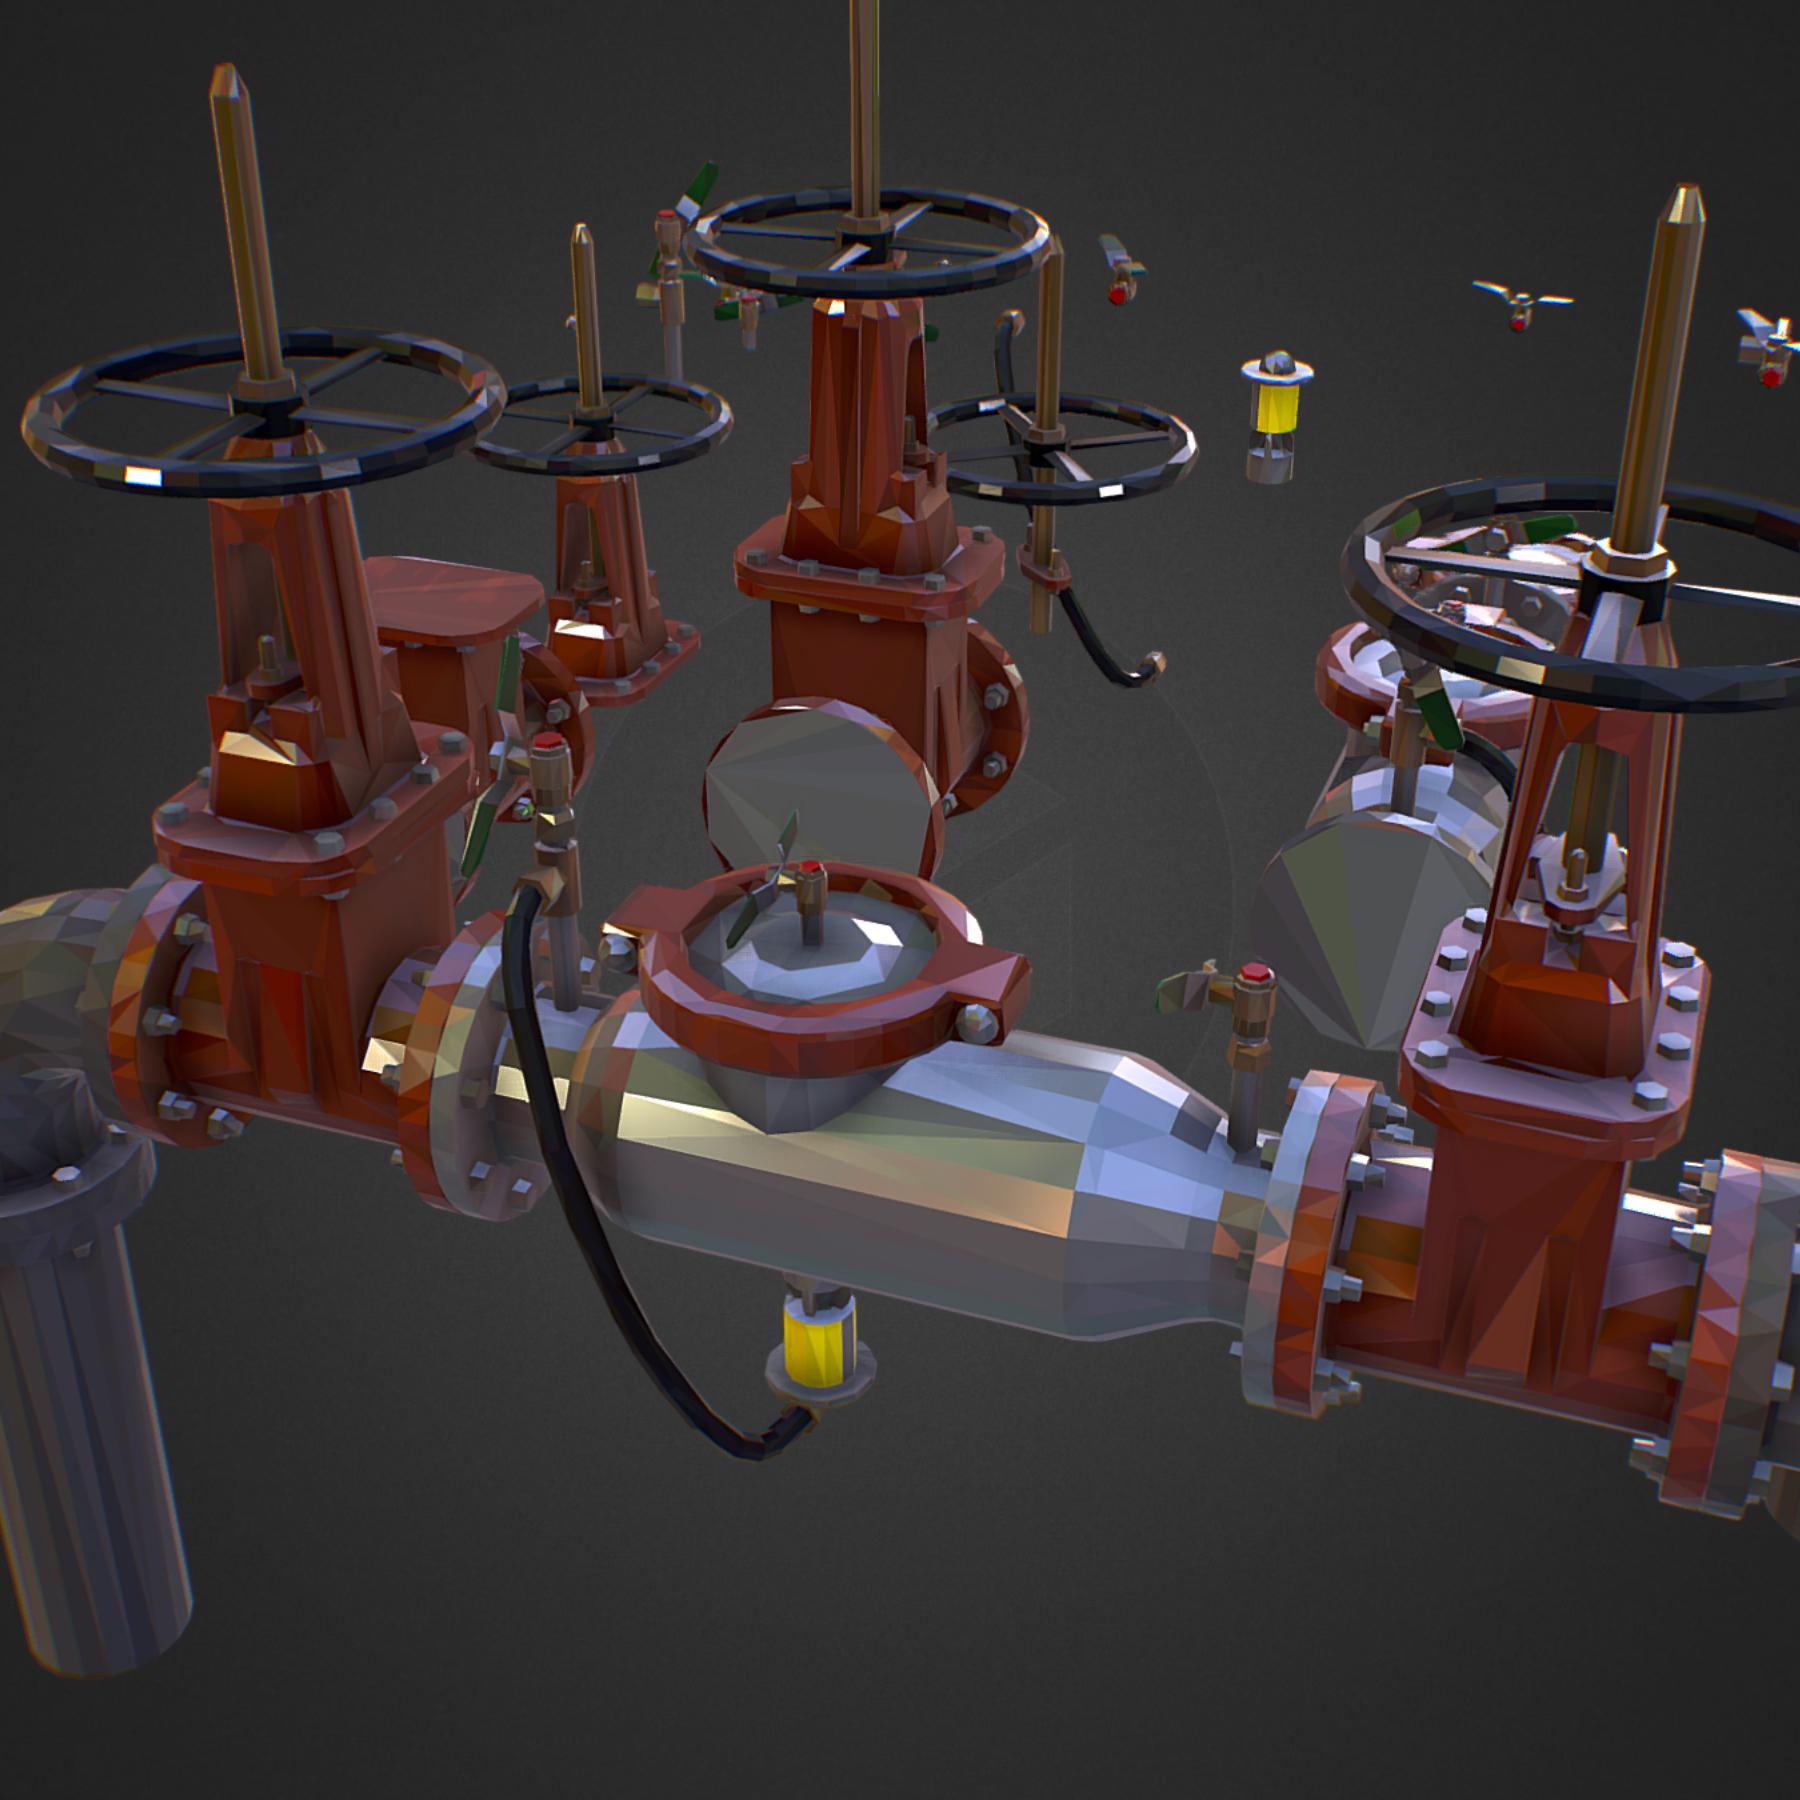 Low Poly ART Backflow Water Pipe Constructor 3d model max 3ds max plugin fbx ma mb tga targa icb vda vst pix obj 272539